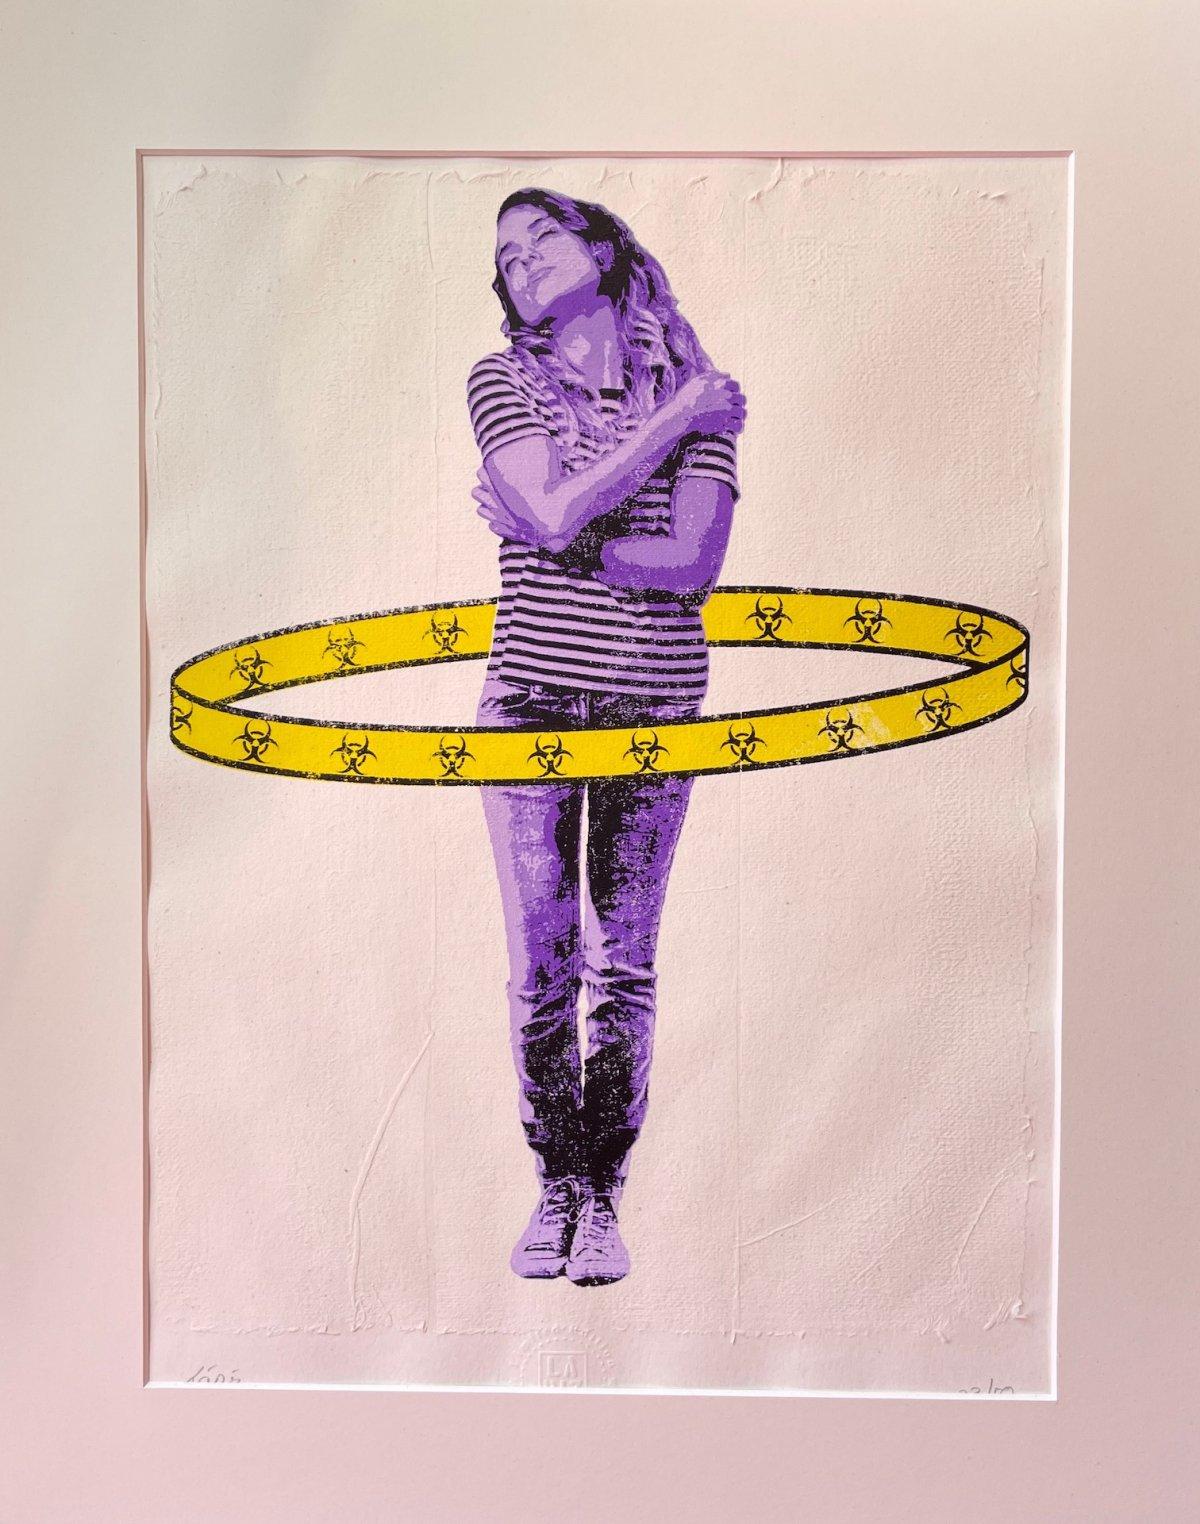 lifeintimeofcorona-lapiz-streetart-galerie-hamburg-popstreetshop